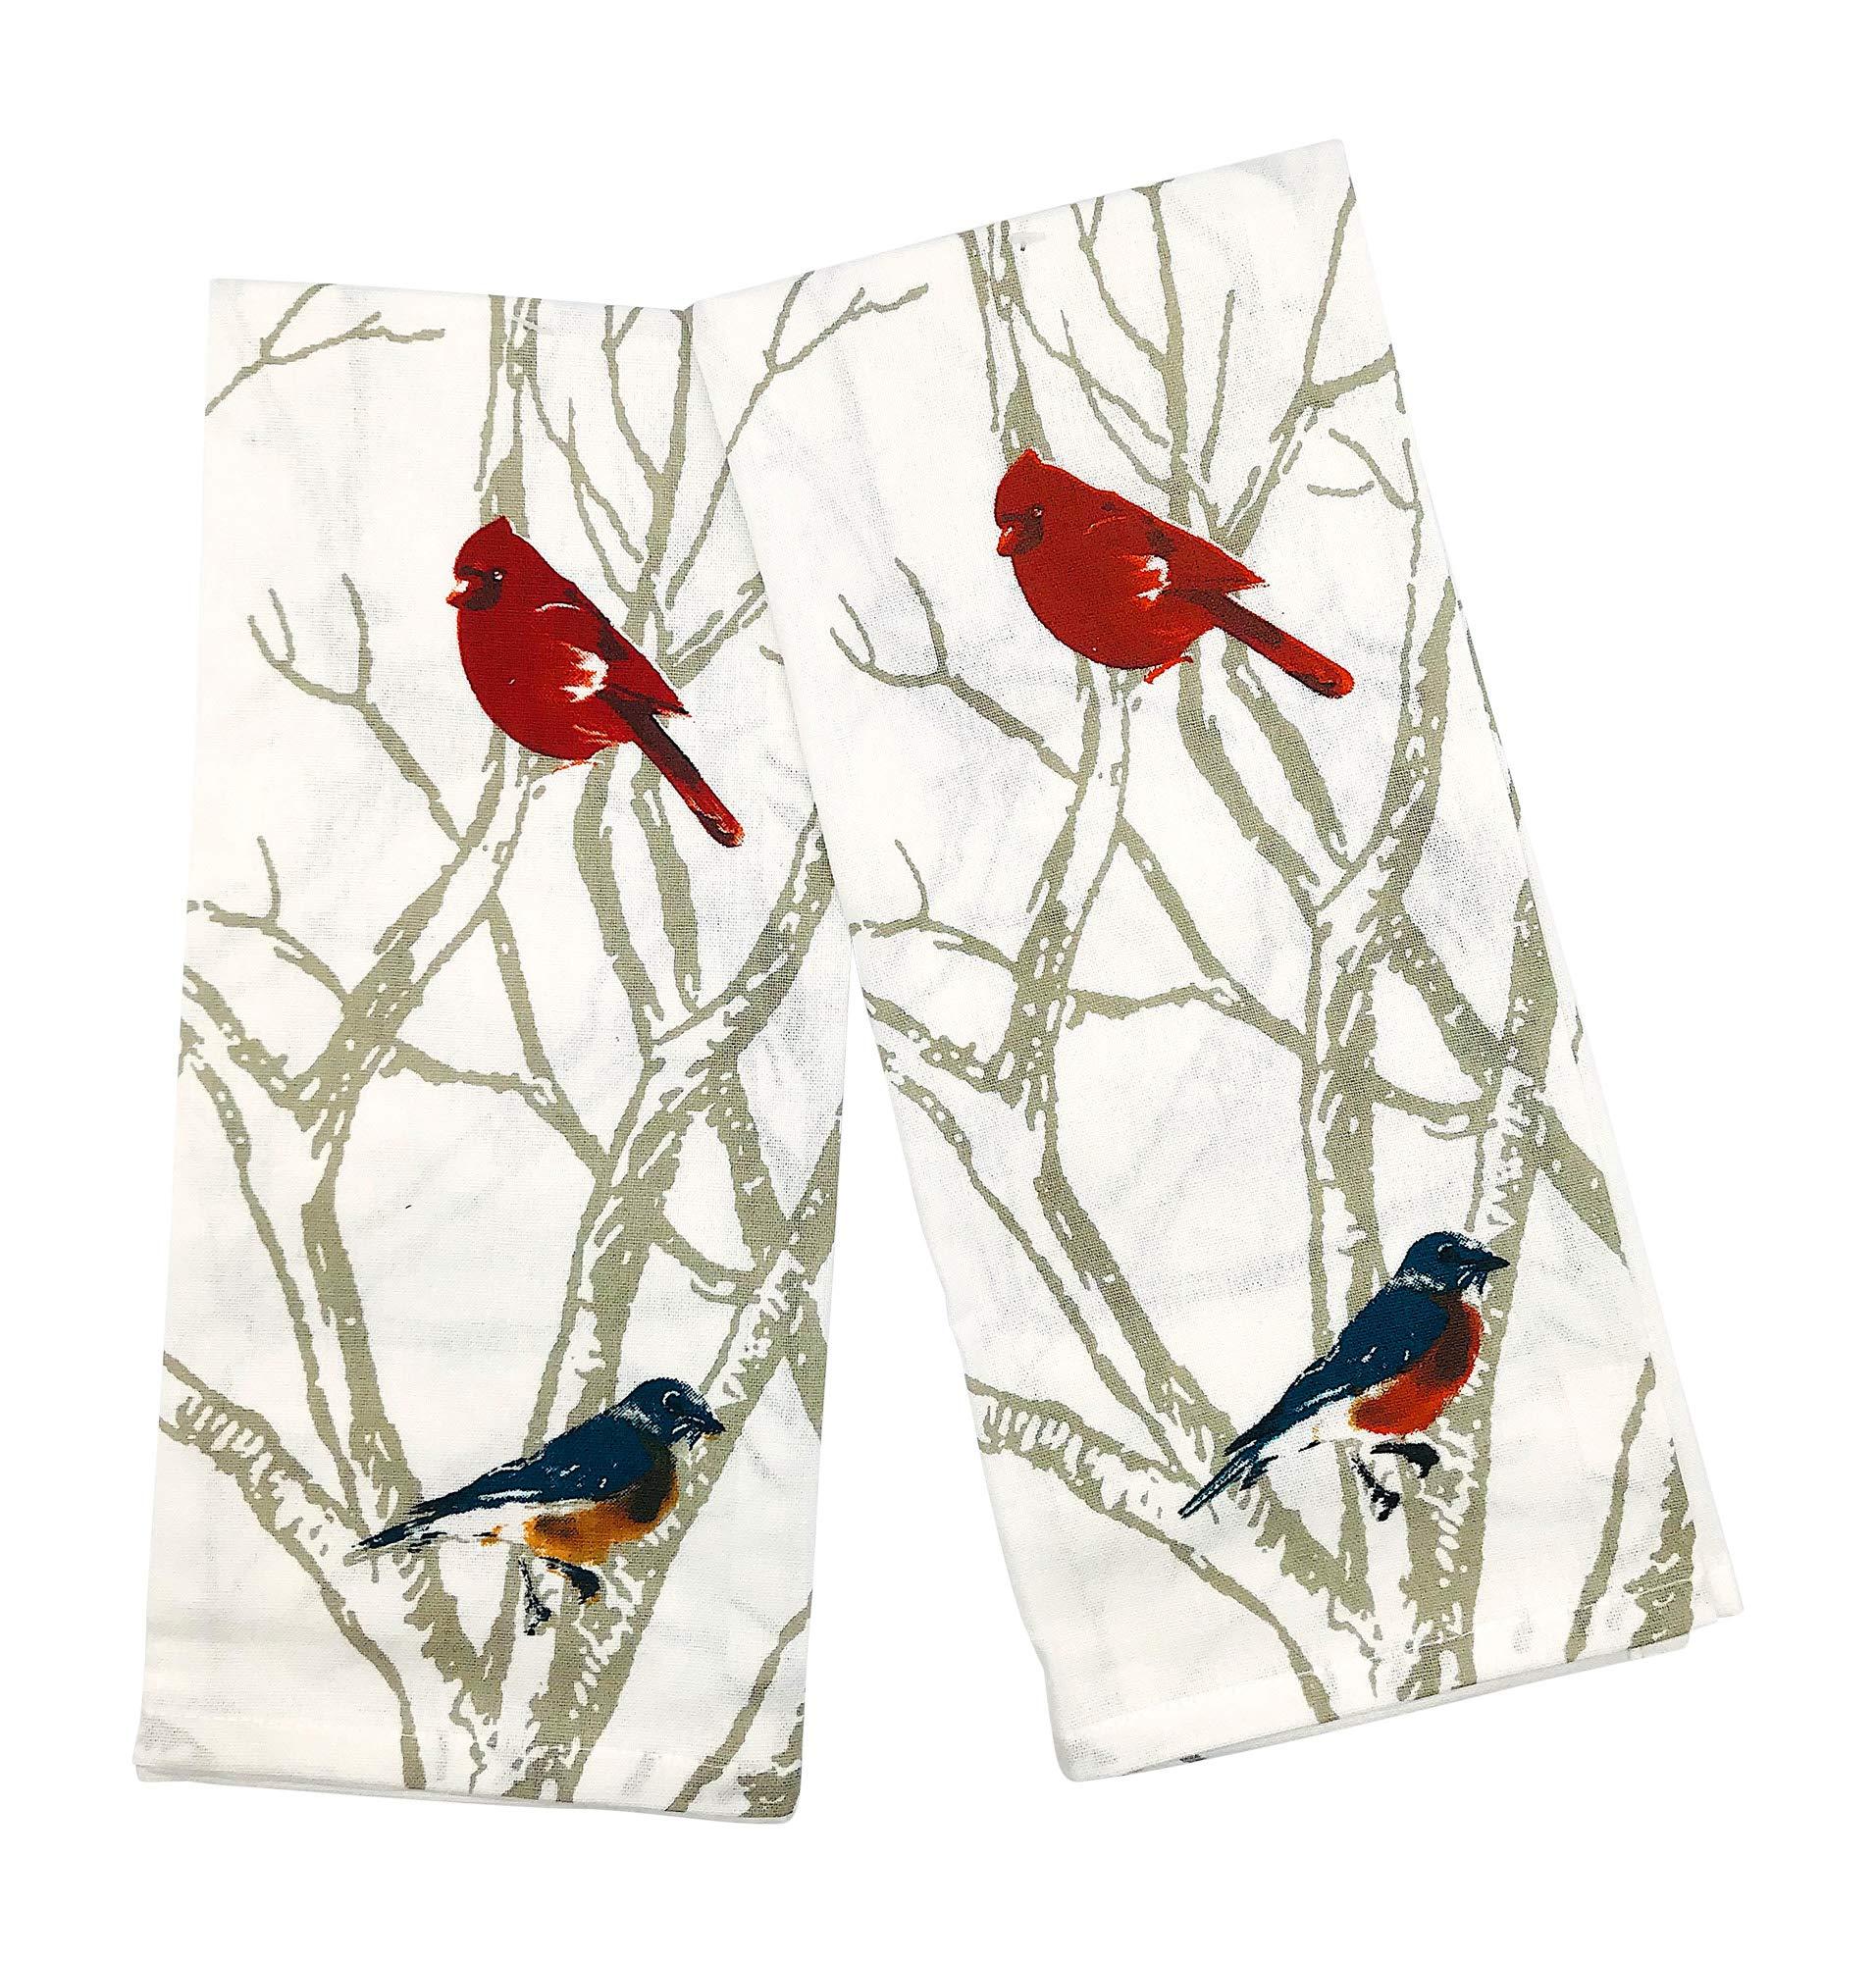 INDIA OVERSEAS Bird Watching Hand Towels: Colorful Artistic Wildlife Design, Set of 2